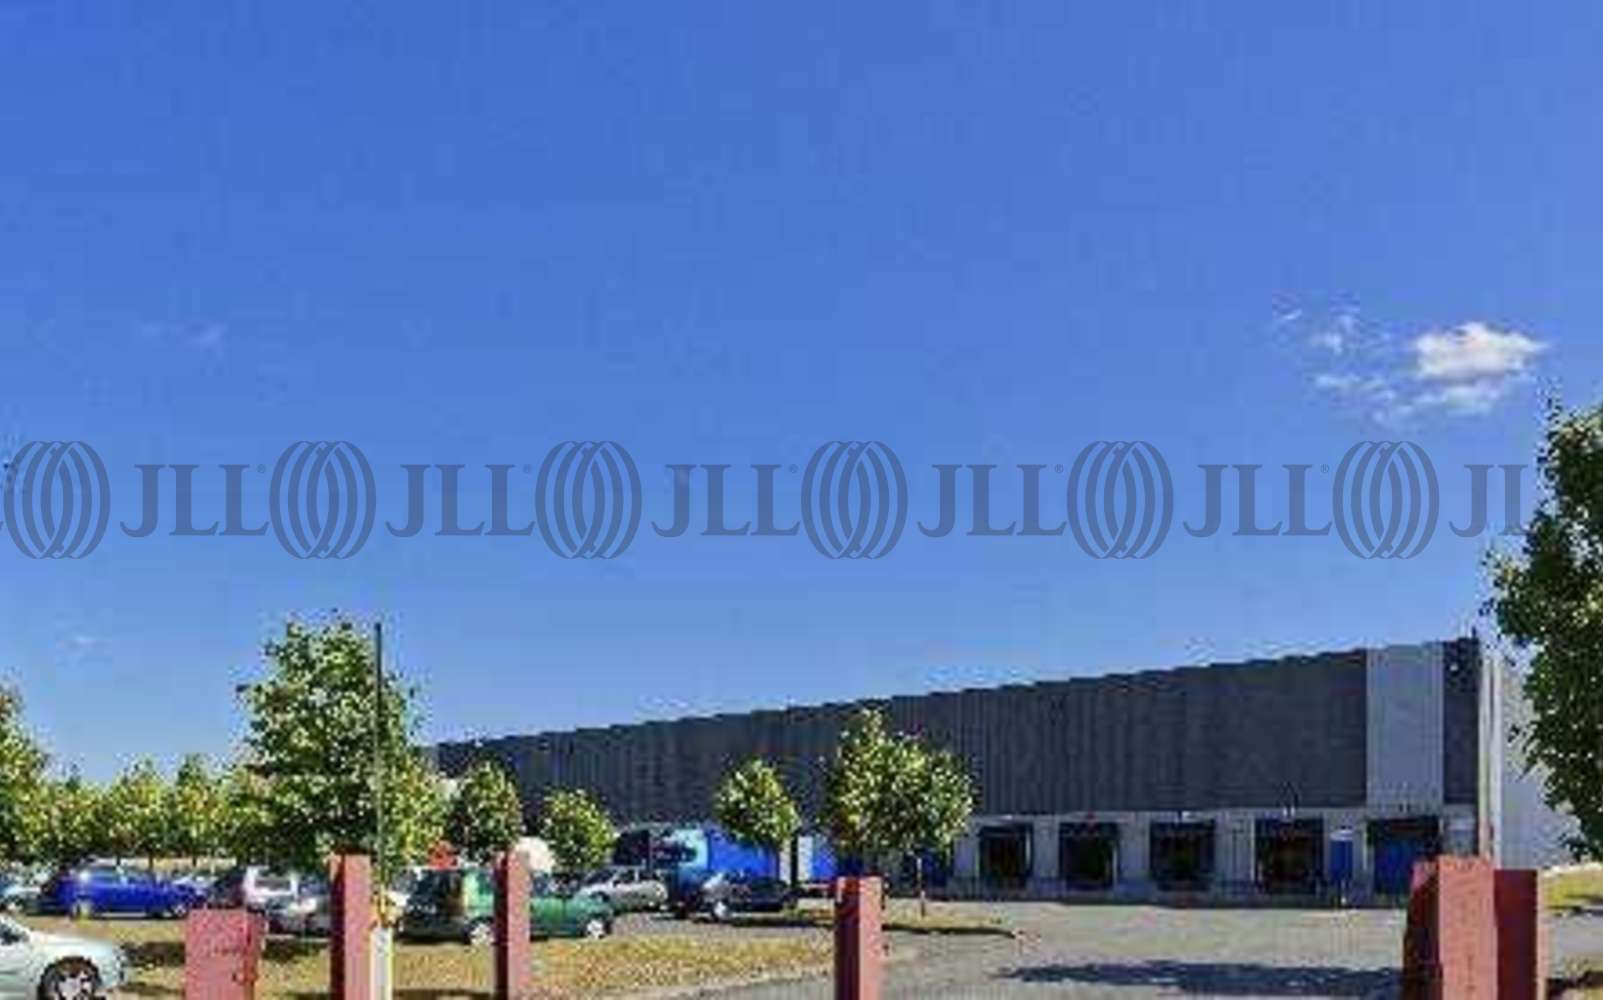 Plateformes logistiques St germain les arpajon, 91180 - 42 RUE HELENE BOUCHER